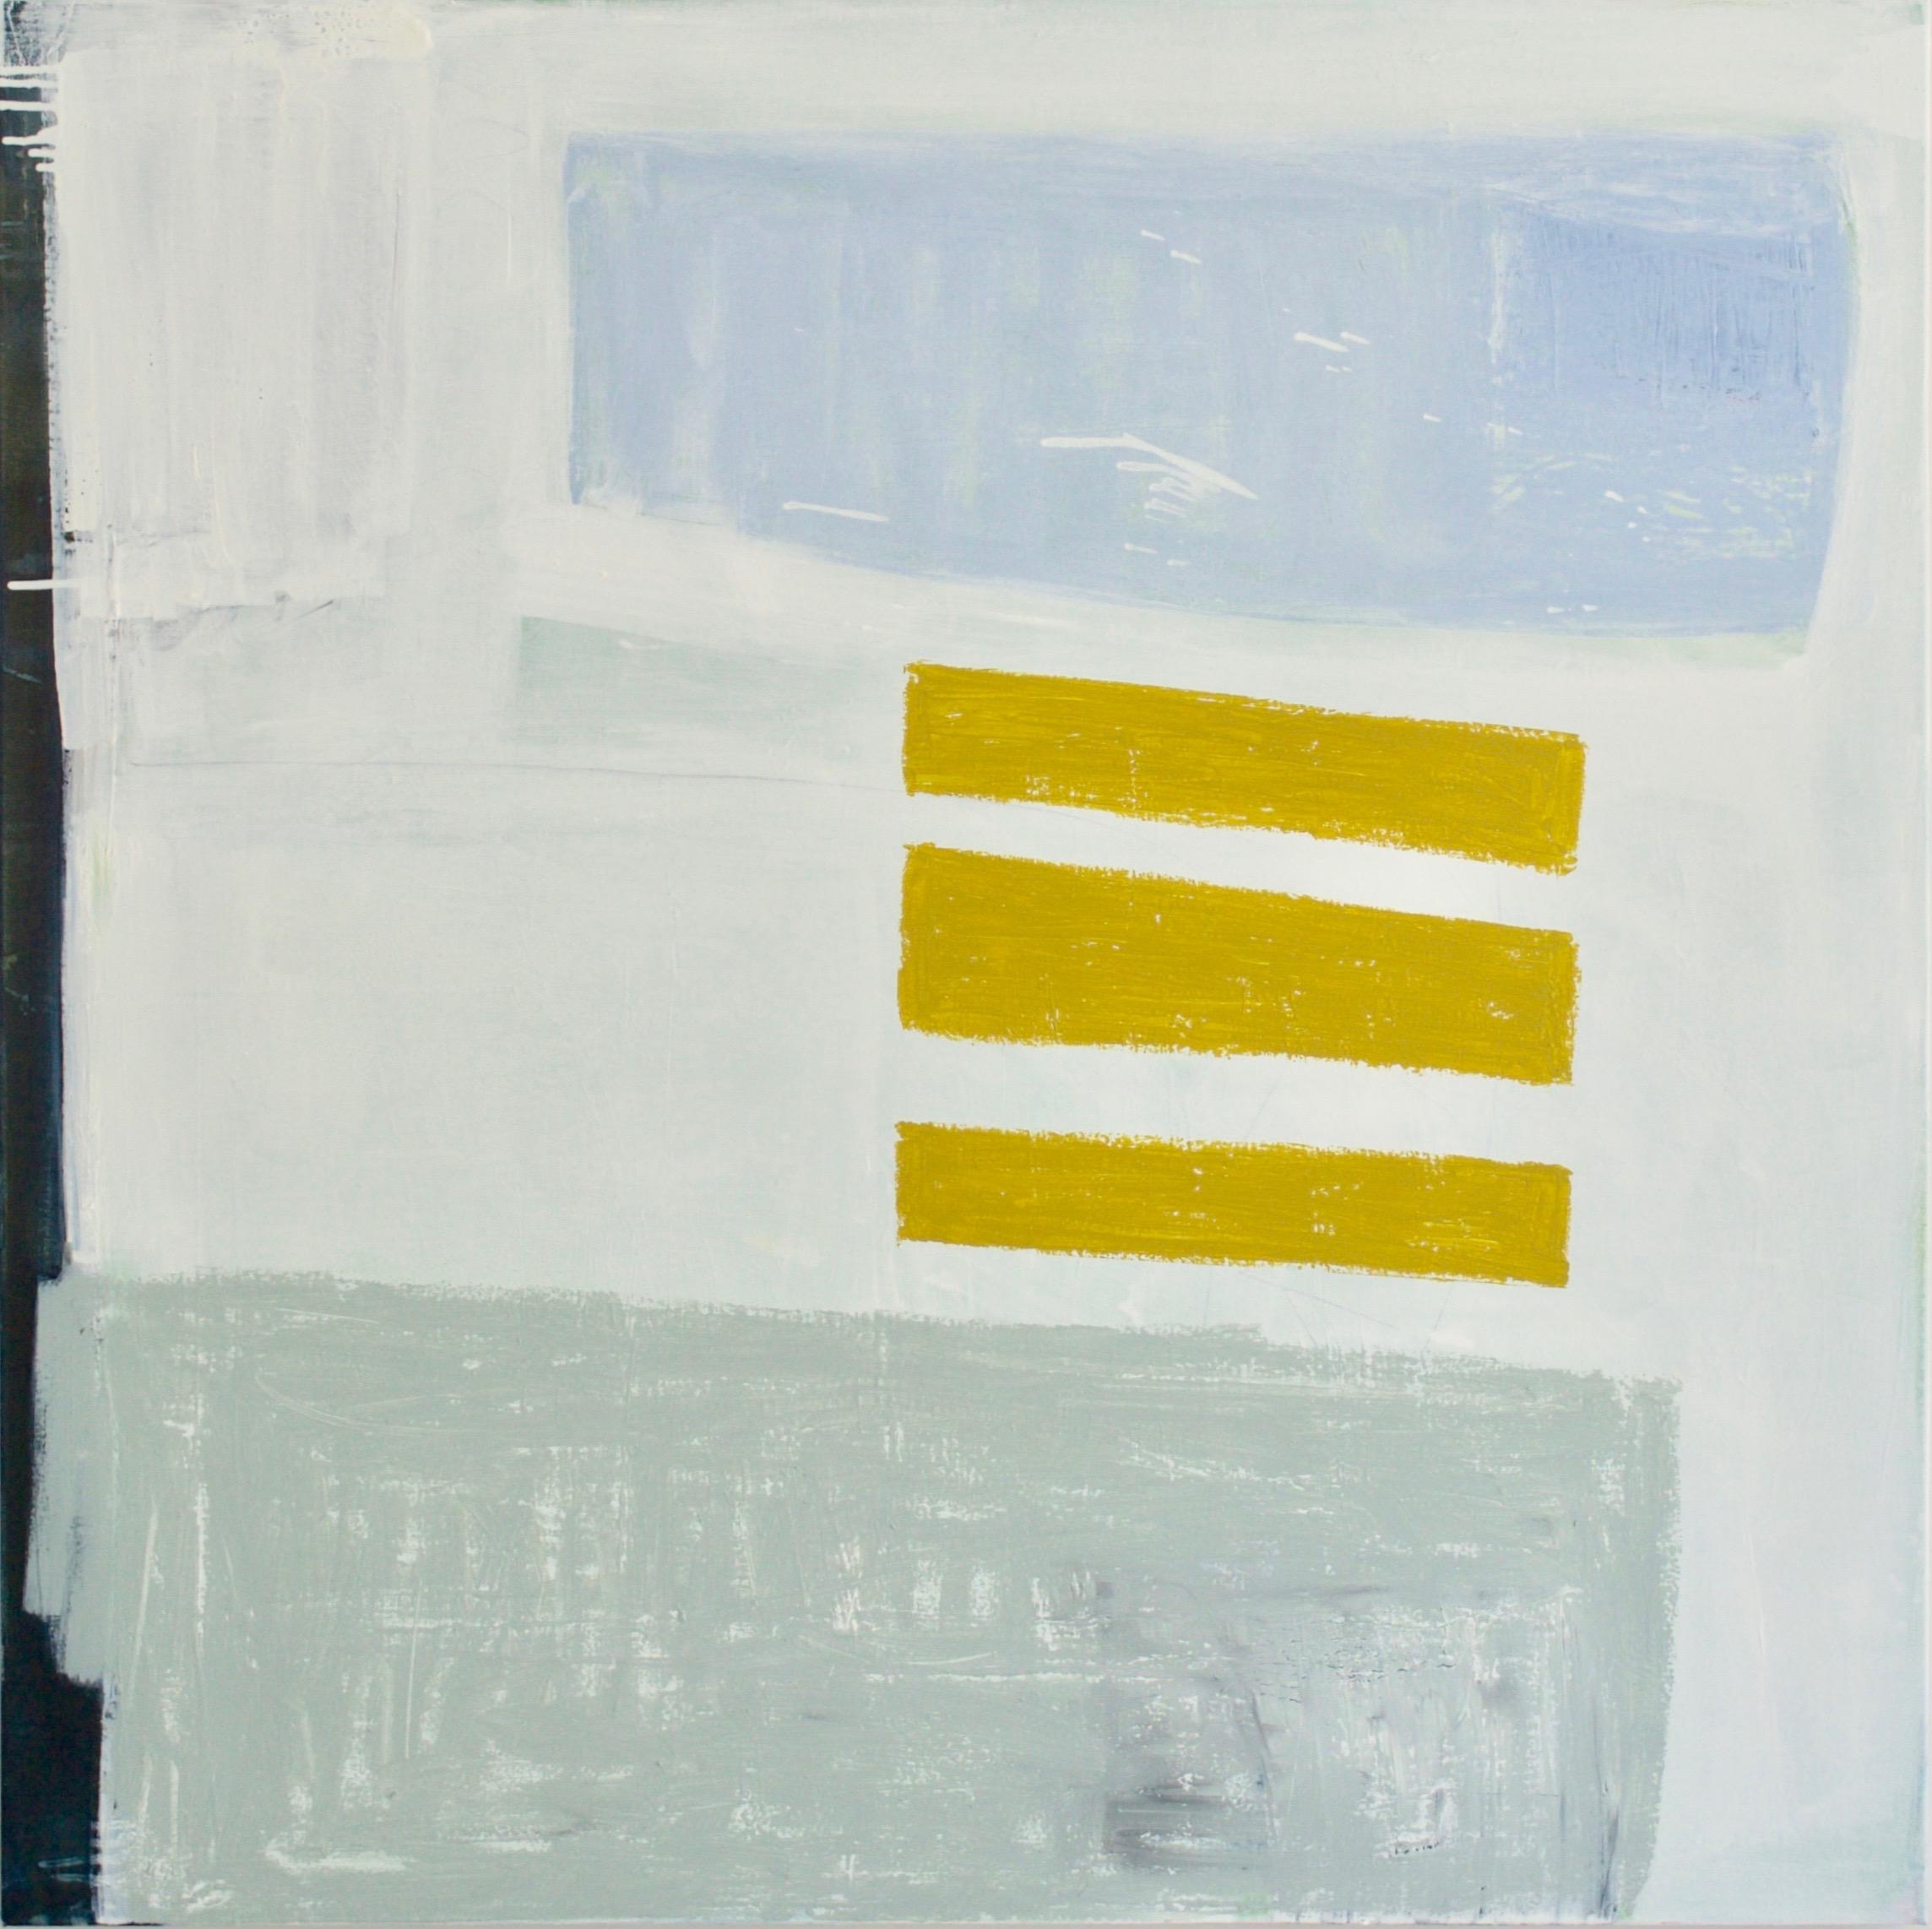 Abstraction No. 4